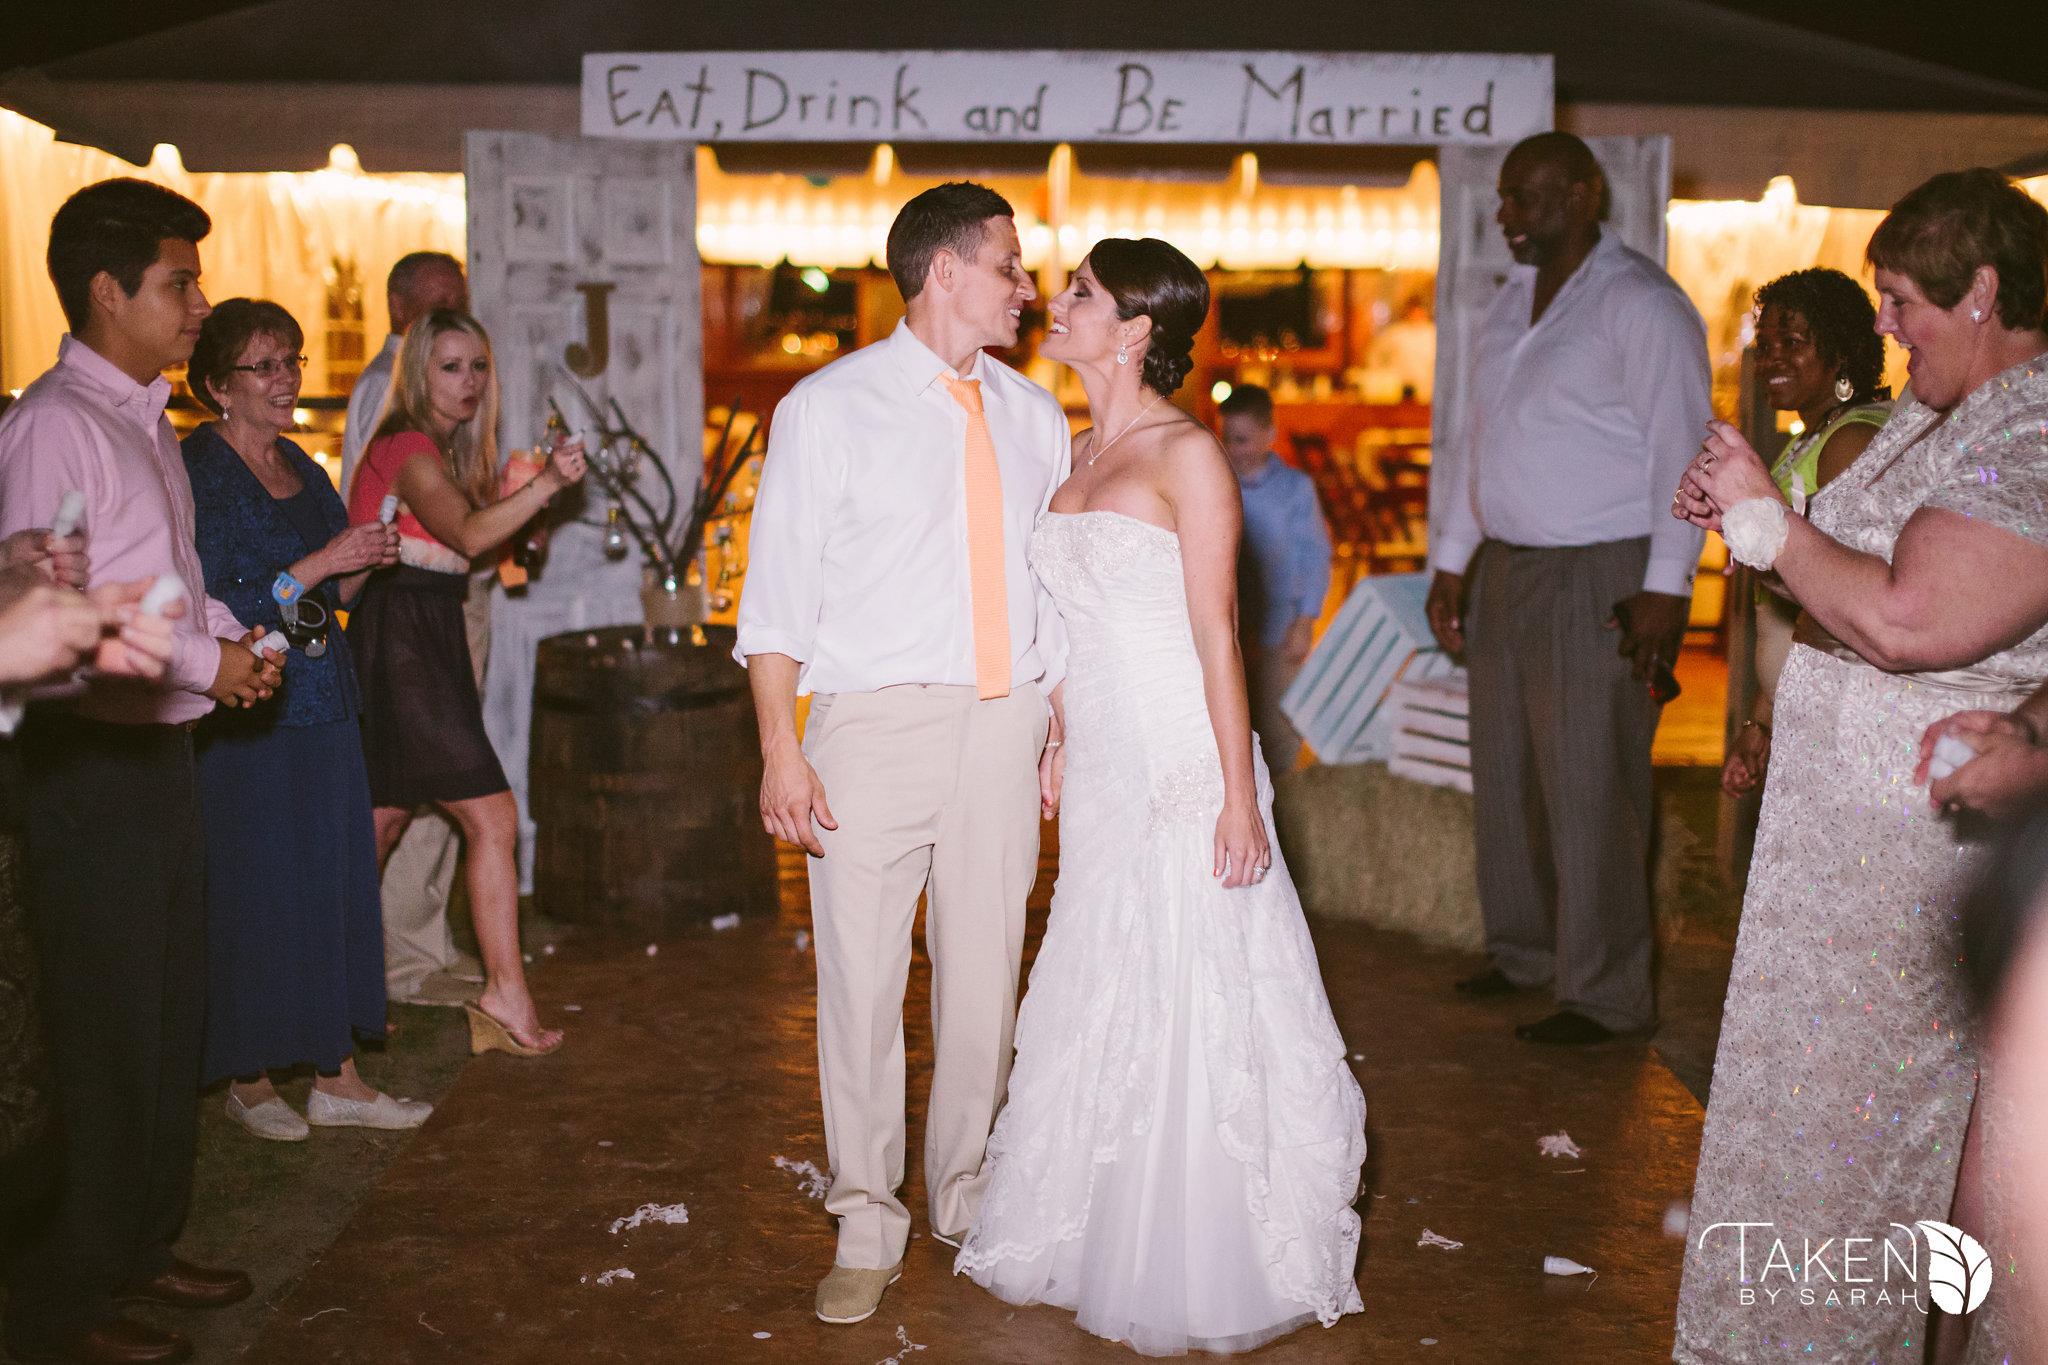 Hidden Acres Real Wedding   Meredith & Jason   Taken by Sarah Photography